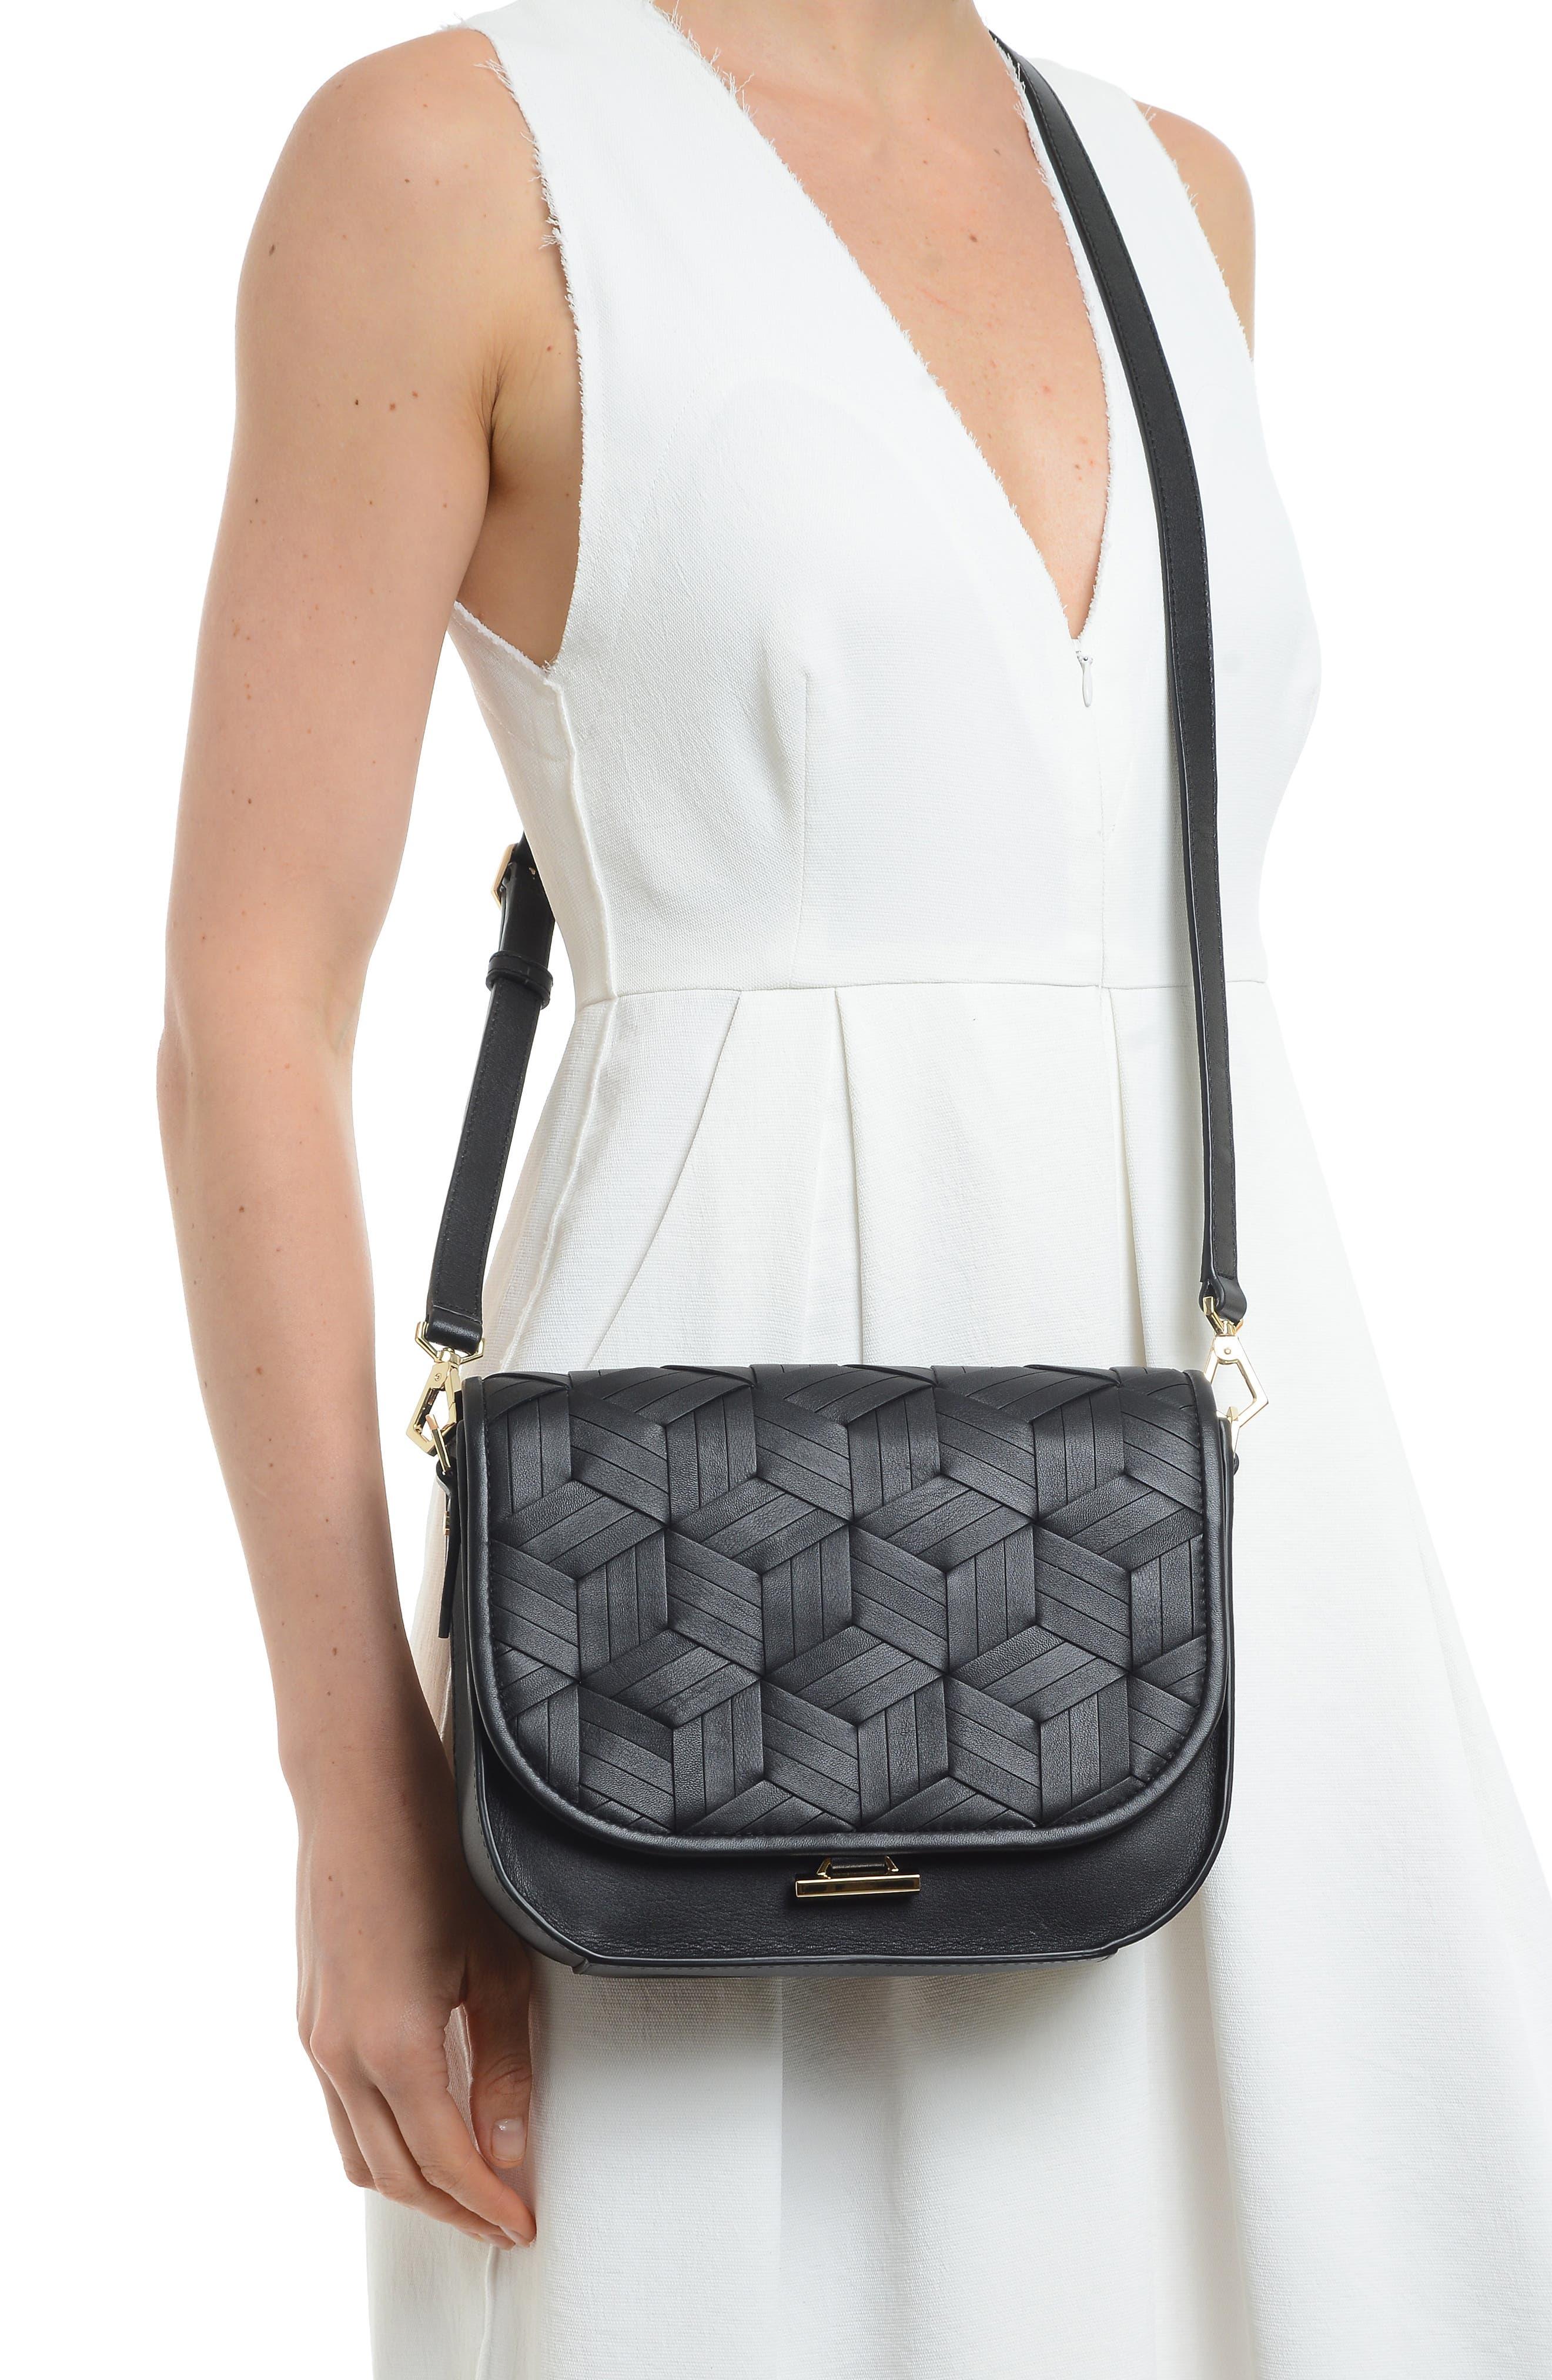 Summit Leather Crossbody Bag,                             Alternate thumbnail 2, color,                             BLACK